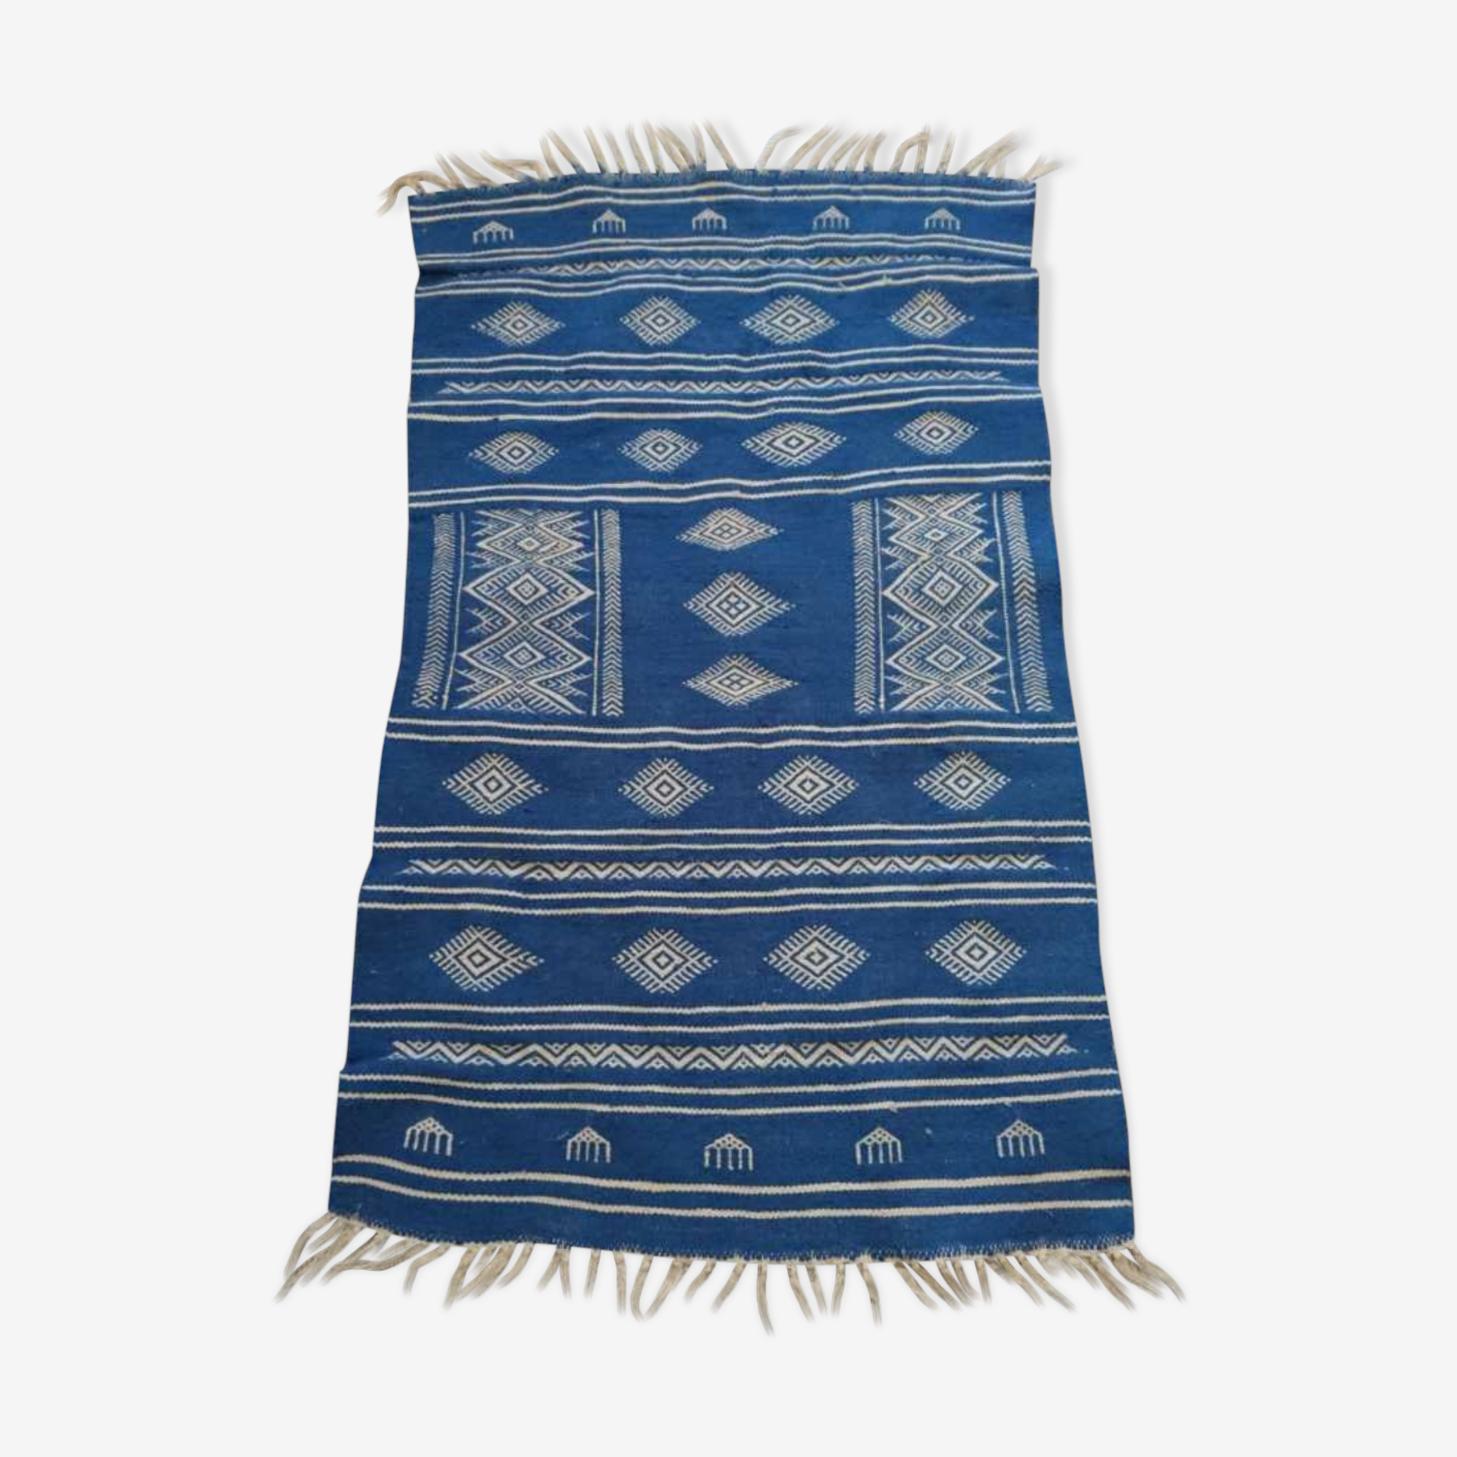 Tapis berbère bleu et blanc 110 x 66 cm